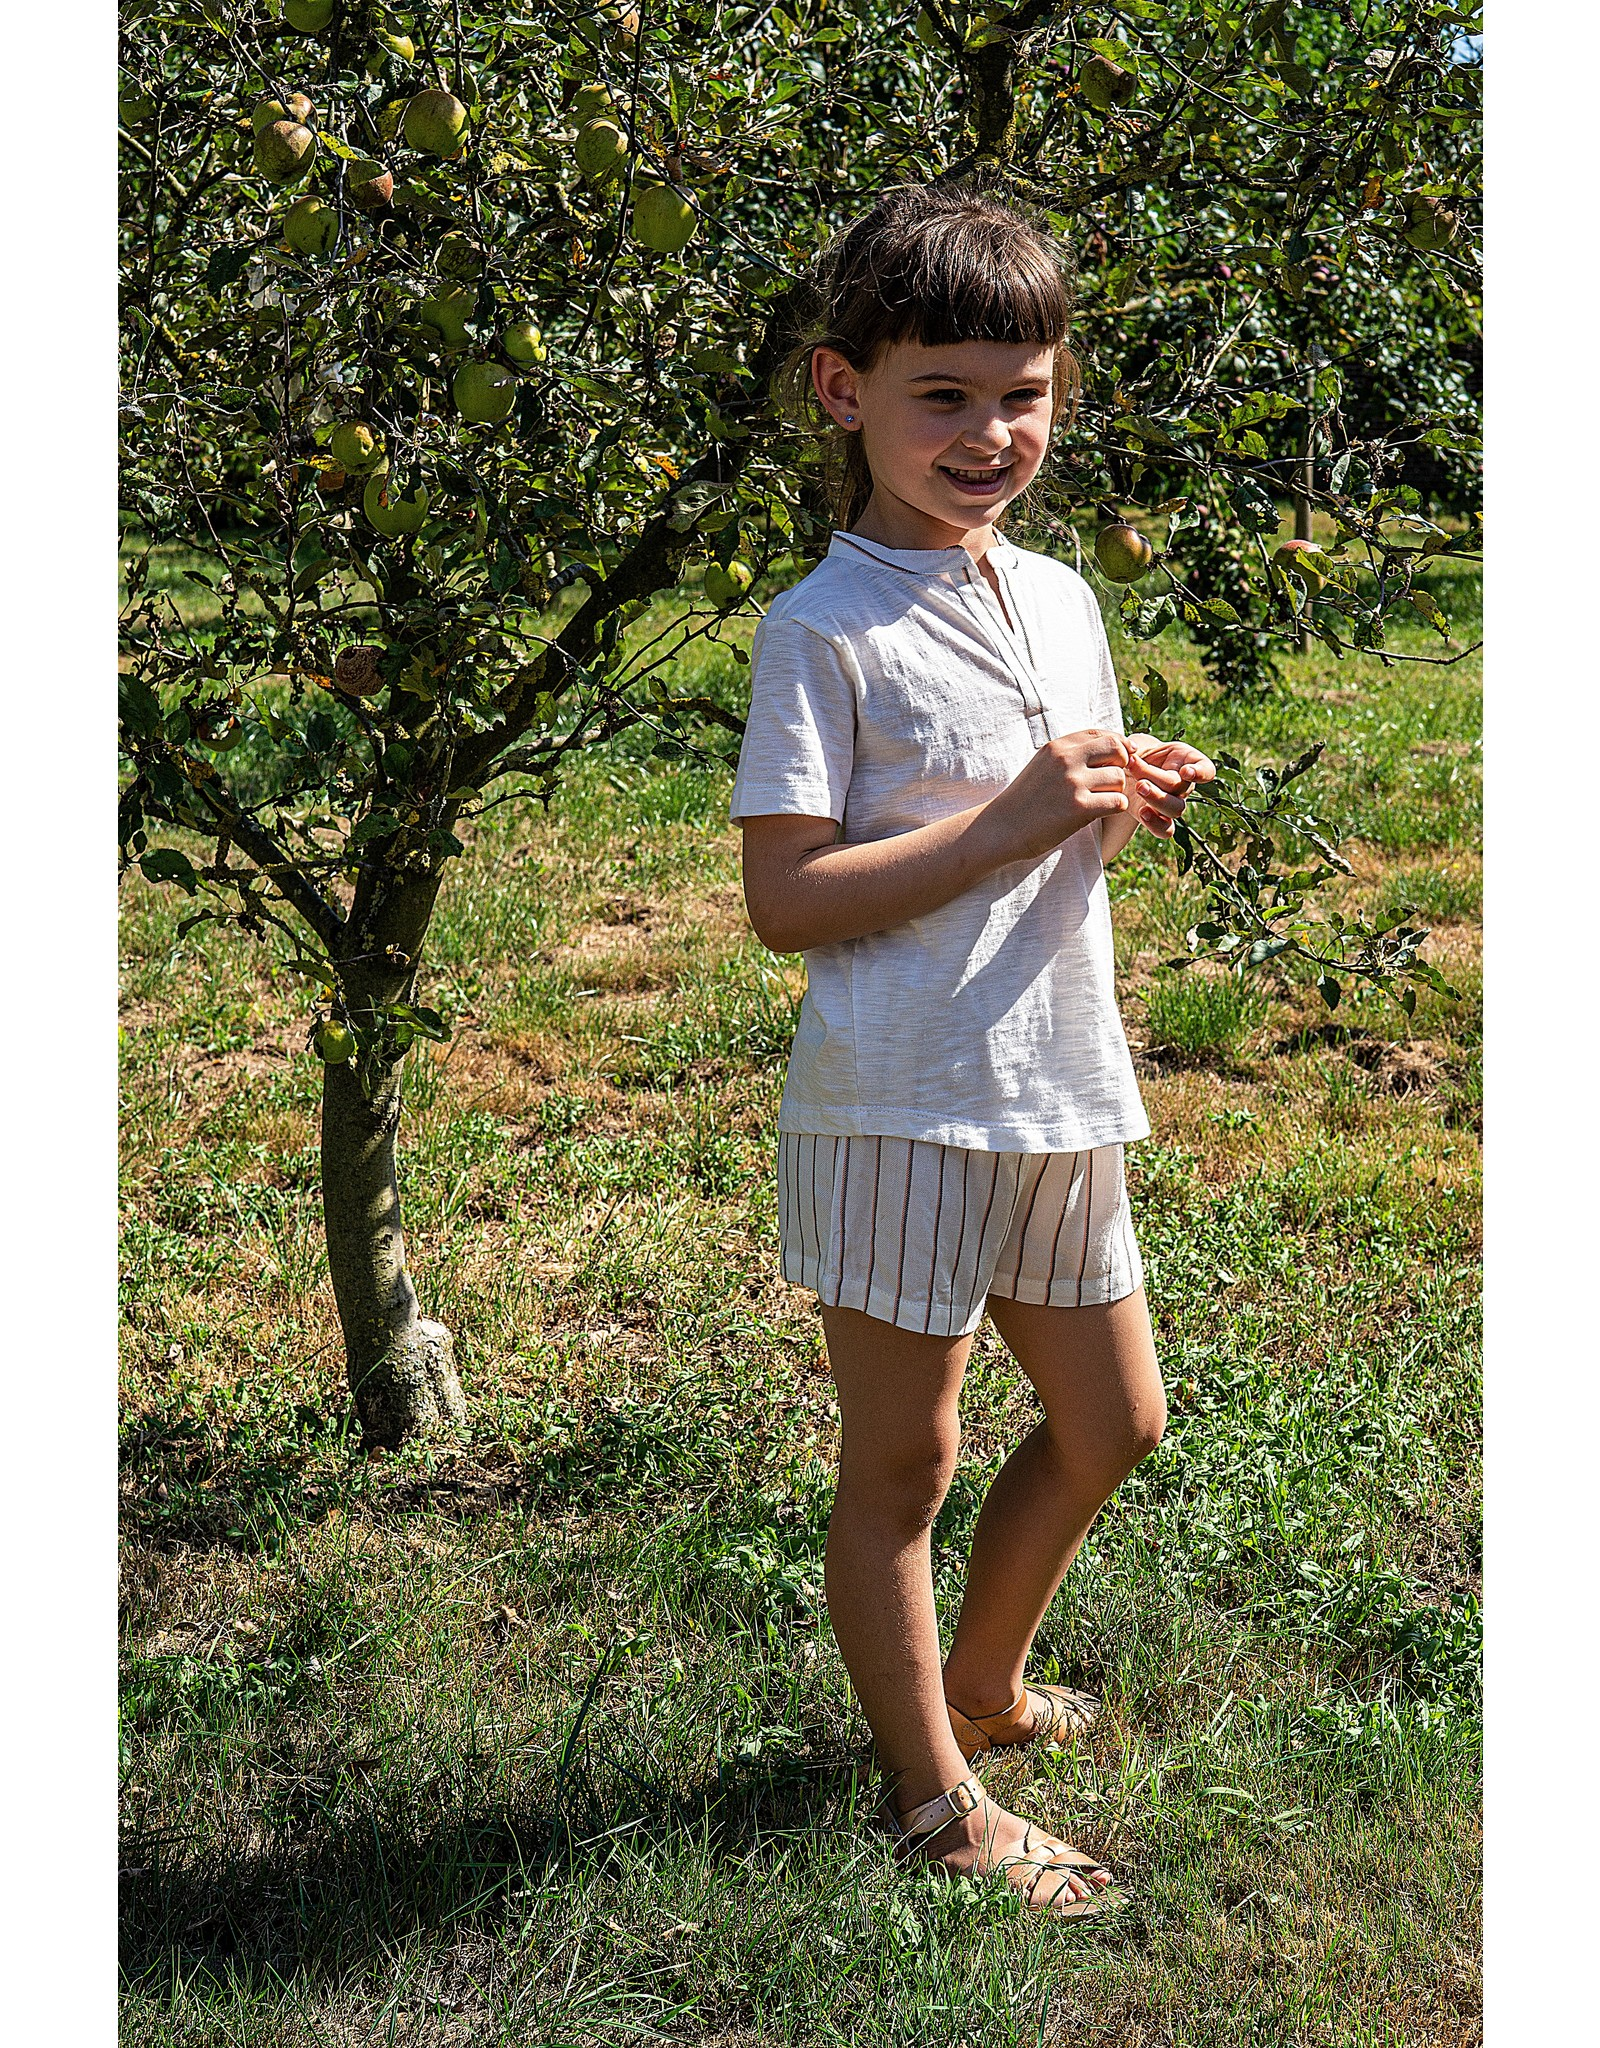 Dorélit Ebre + Mars | Pajama Set Woven | Stripe Viscose